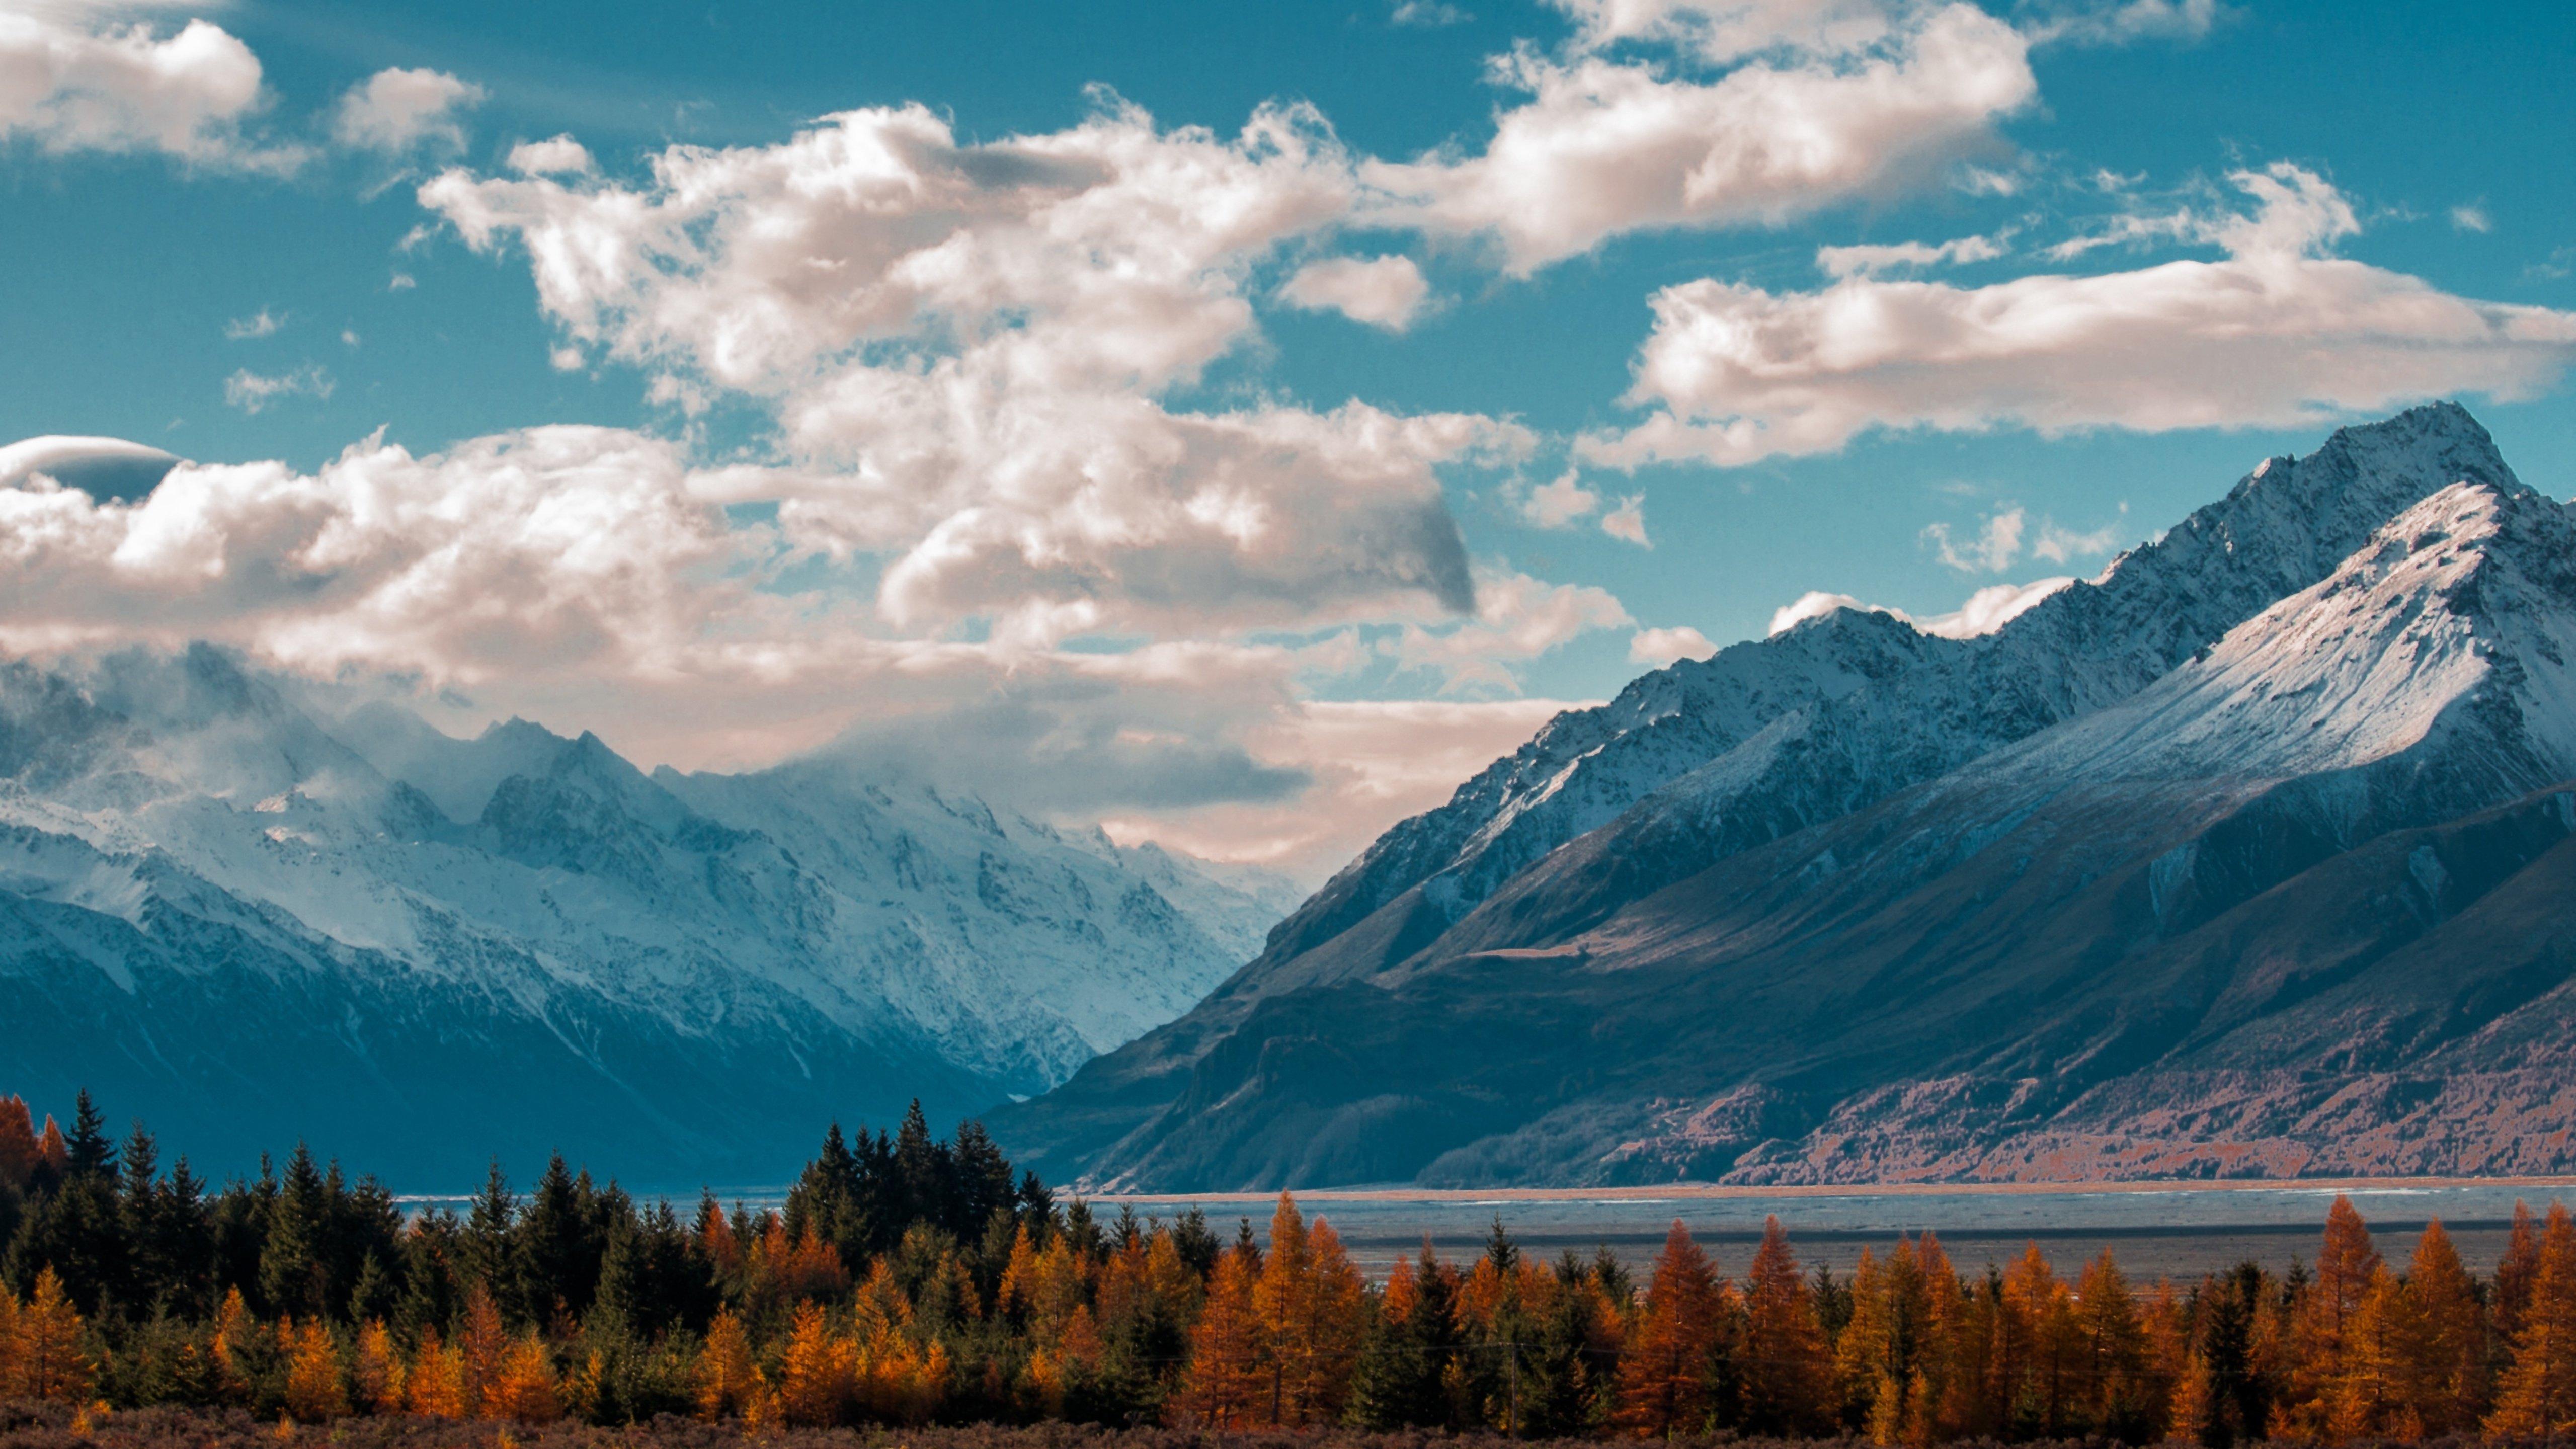 Mountains Landscape 4K wallpaper